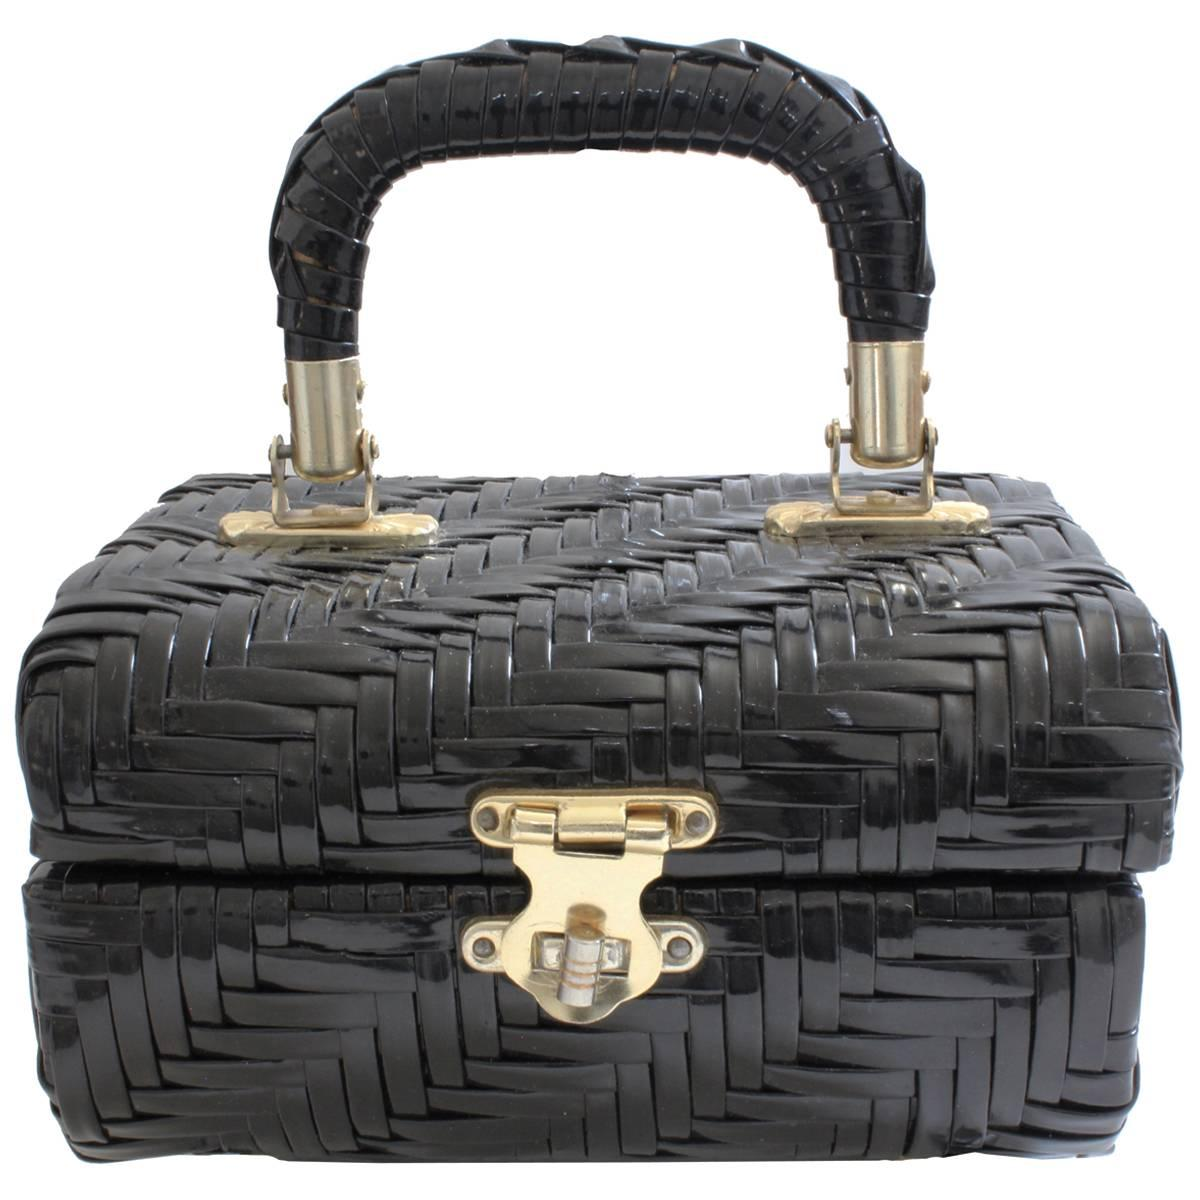 1960s DELILL Box Purse Black Woven with Top Handle Jewelry Tote Bag